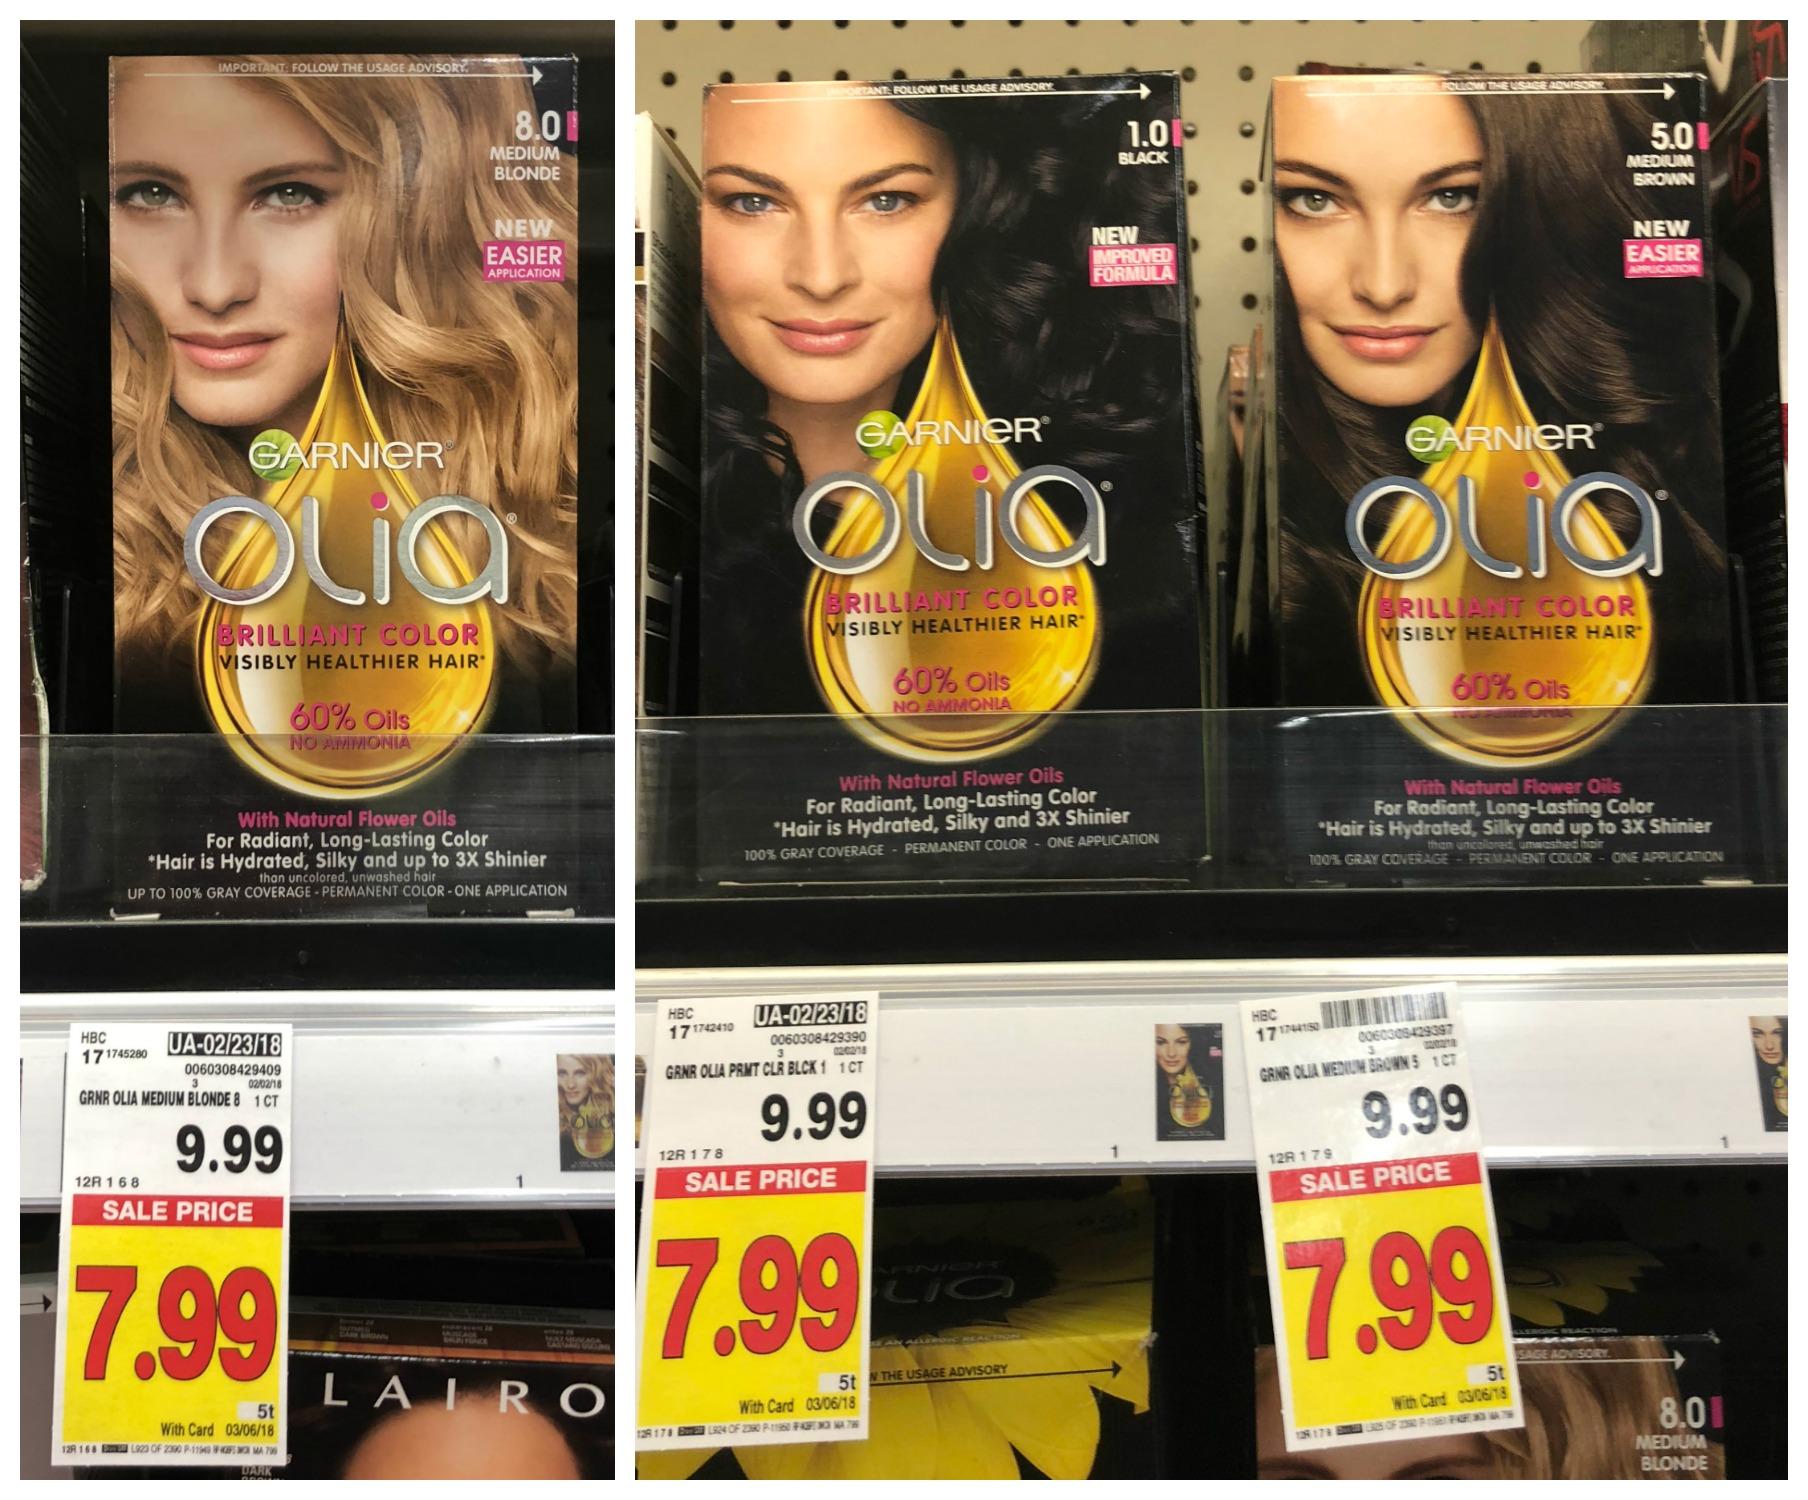 New 300 Garnier Coupon Olia Hair Color Only 499 Reg 999